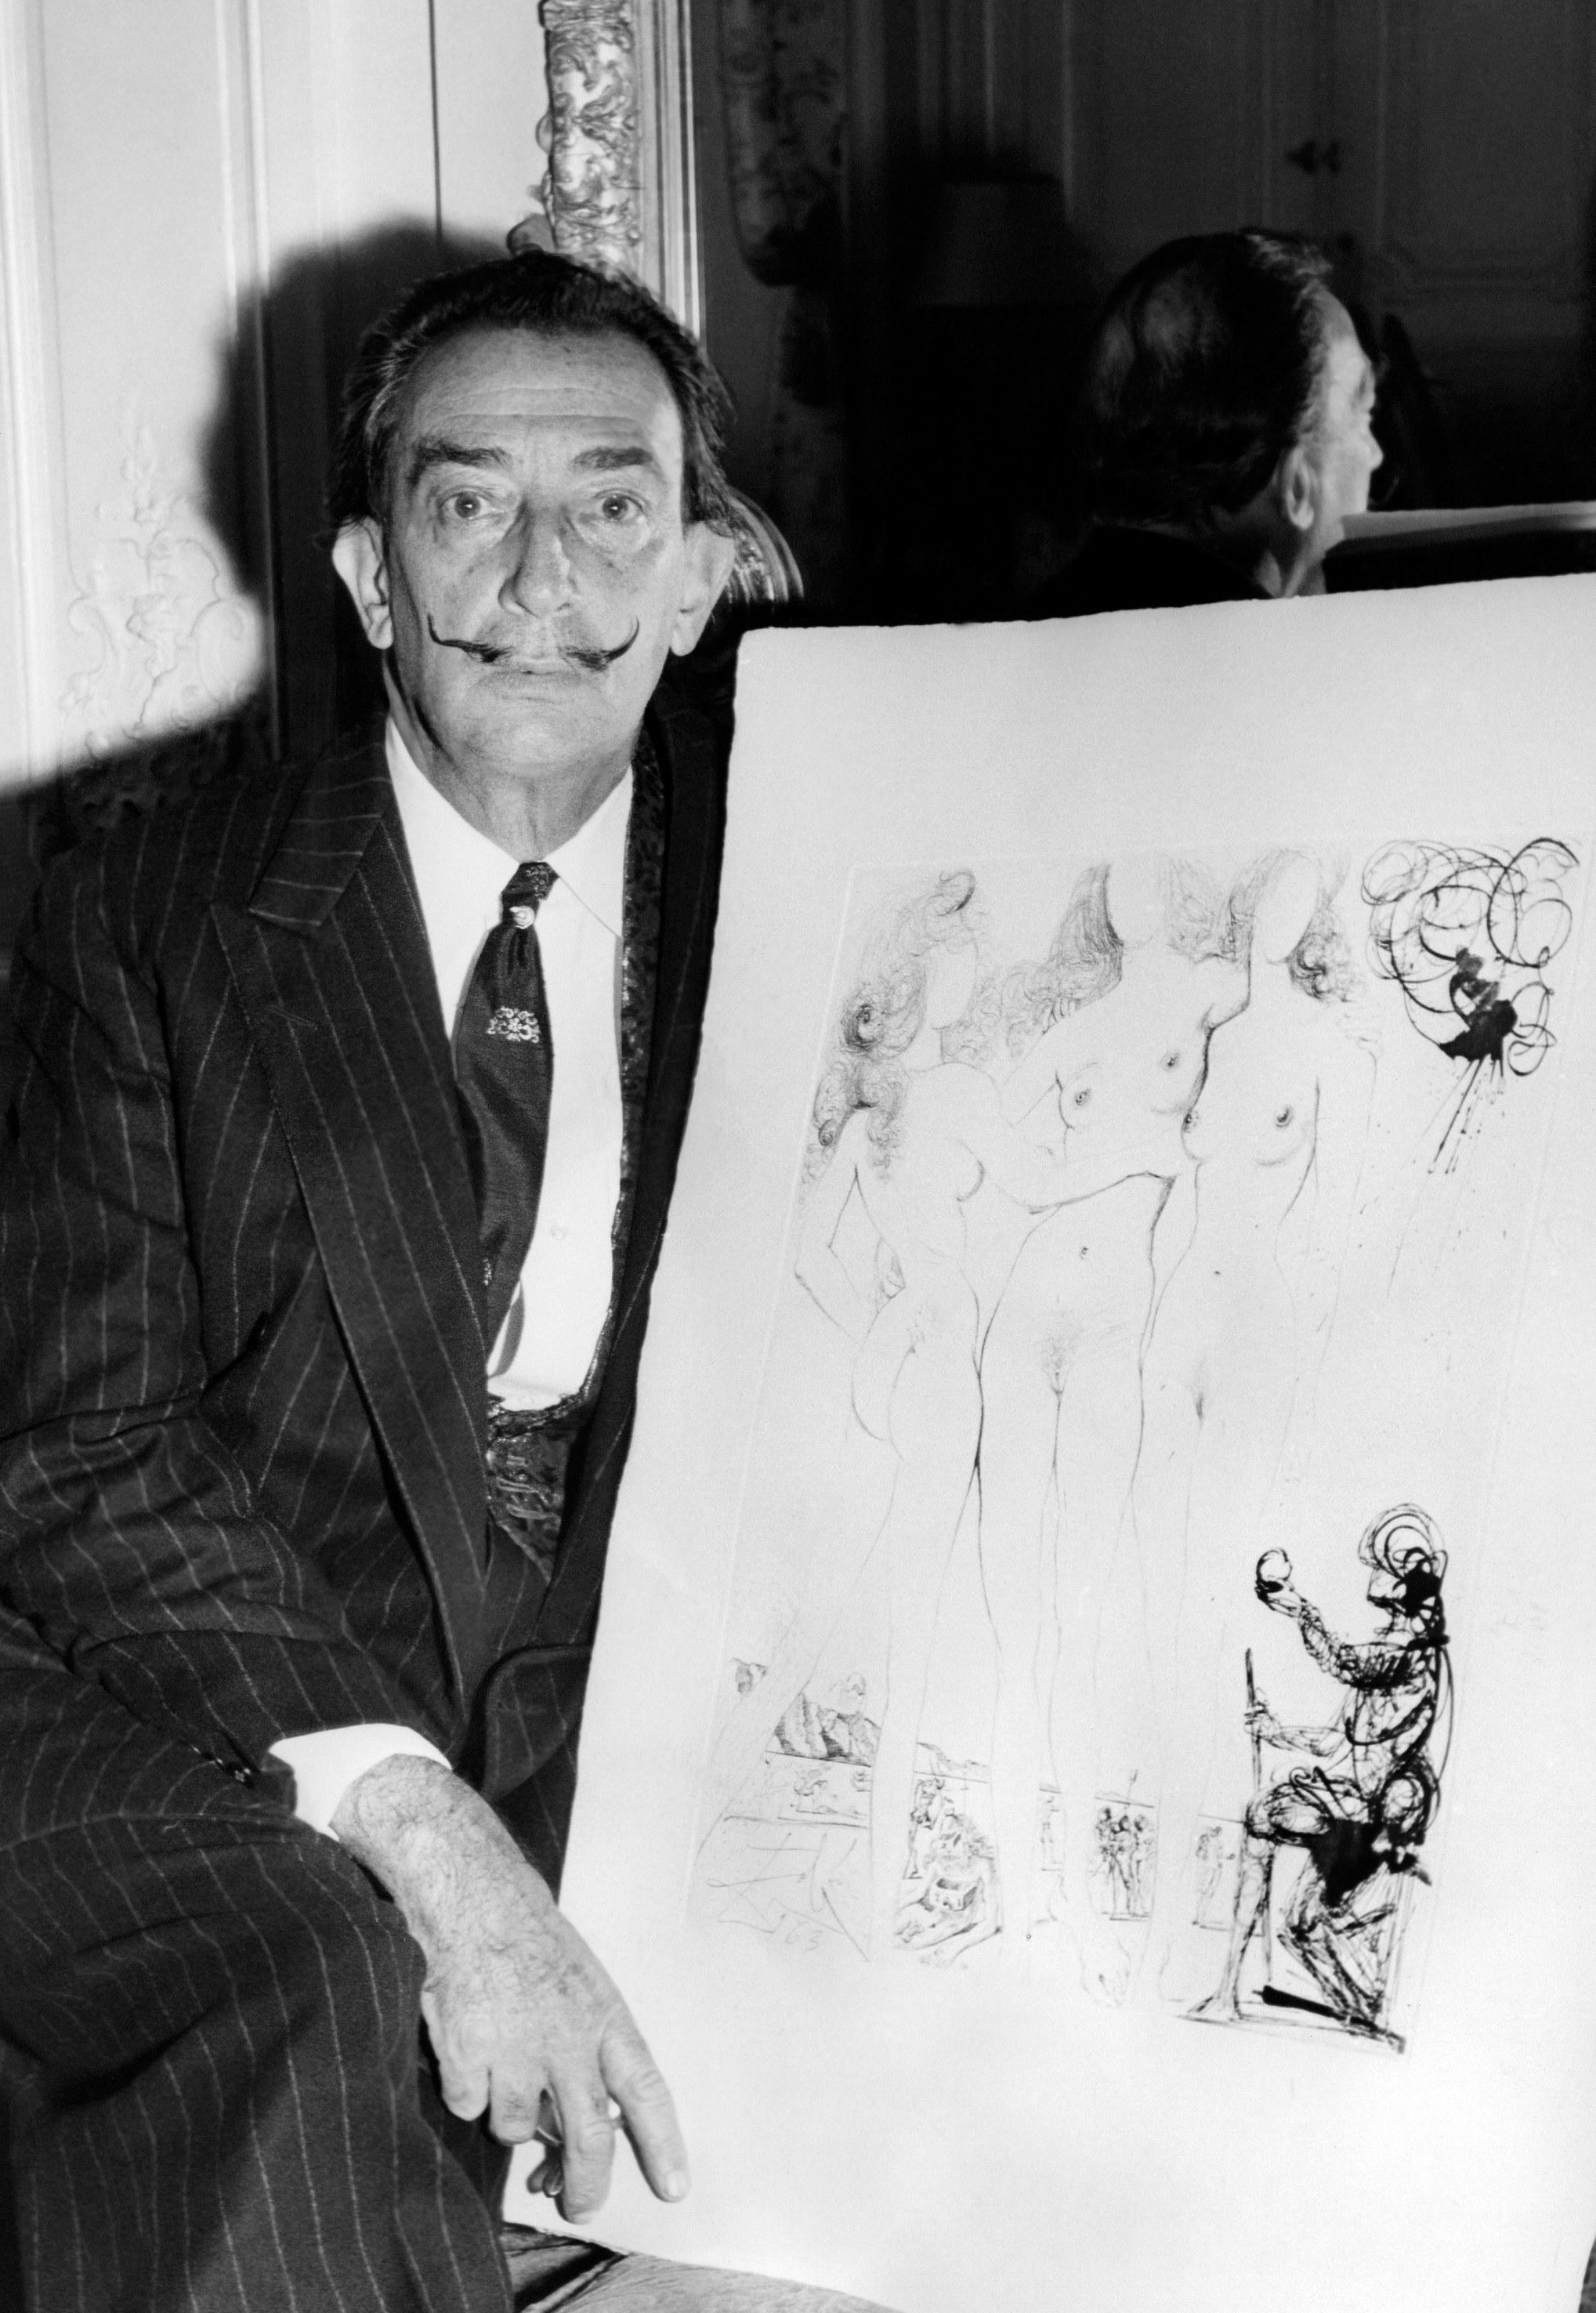 Salvador Dali with drawings